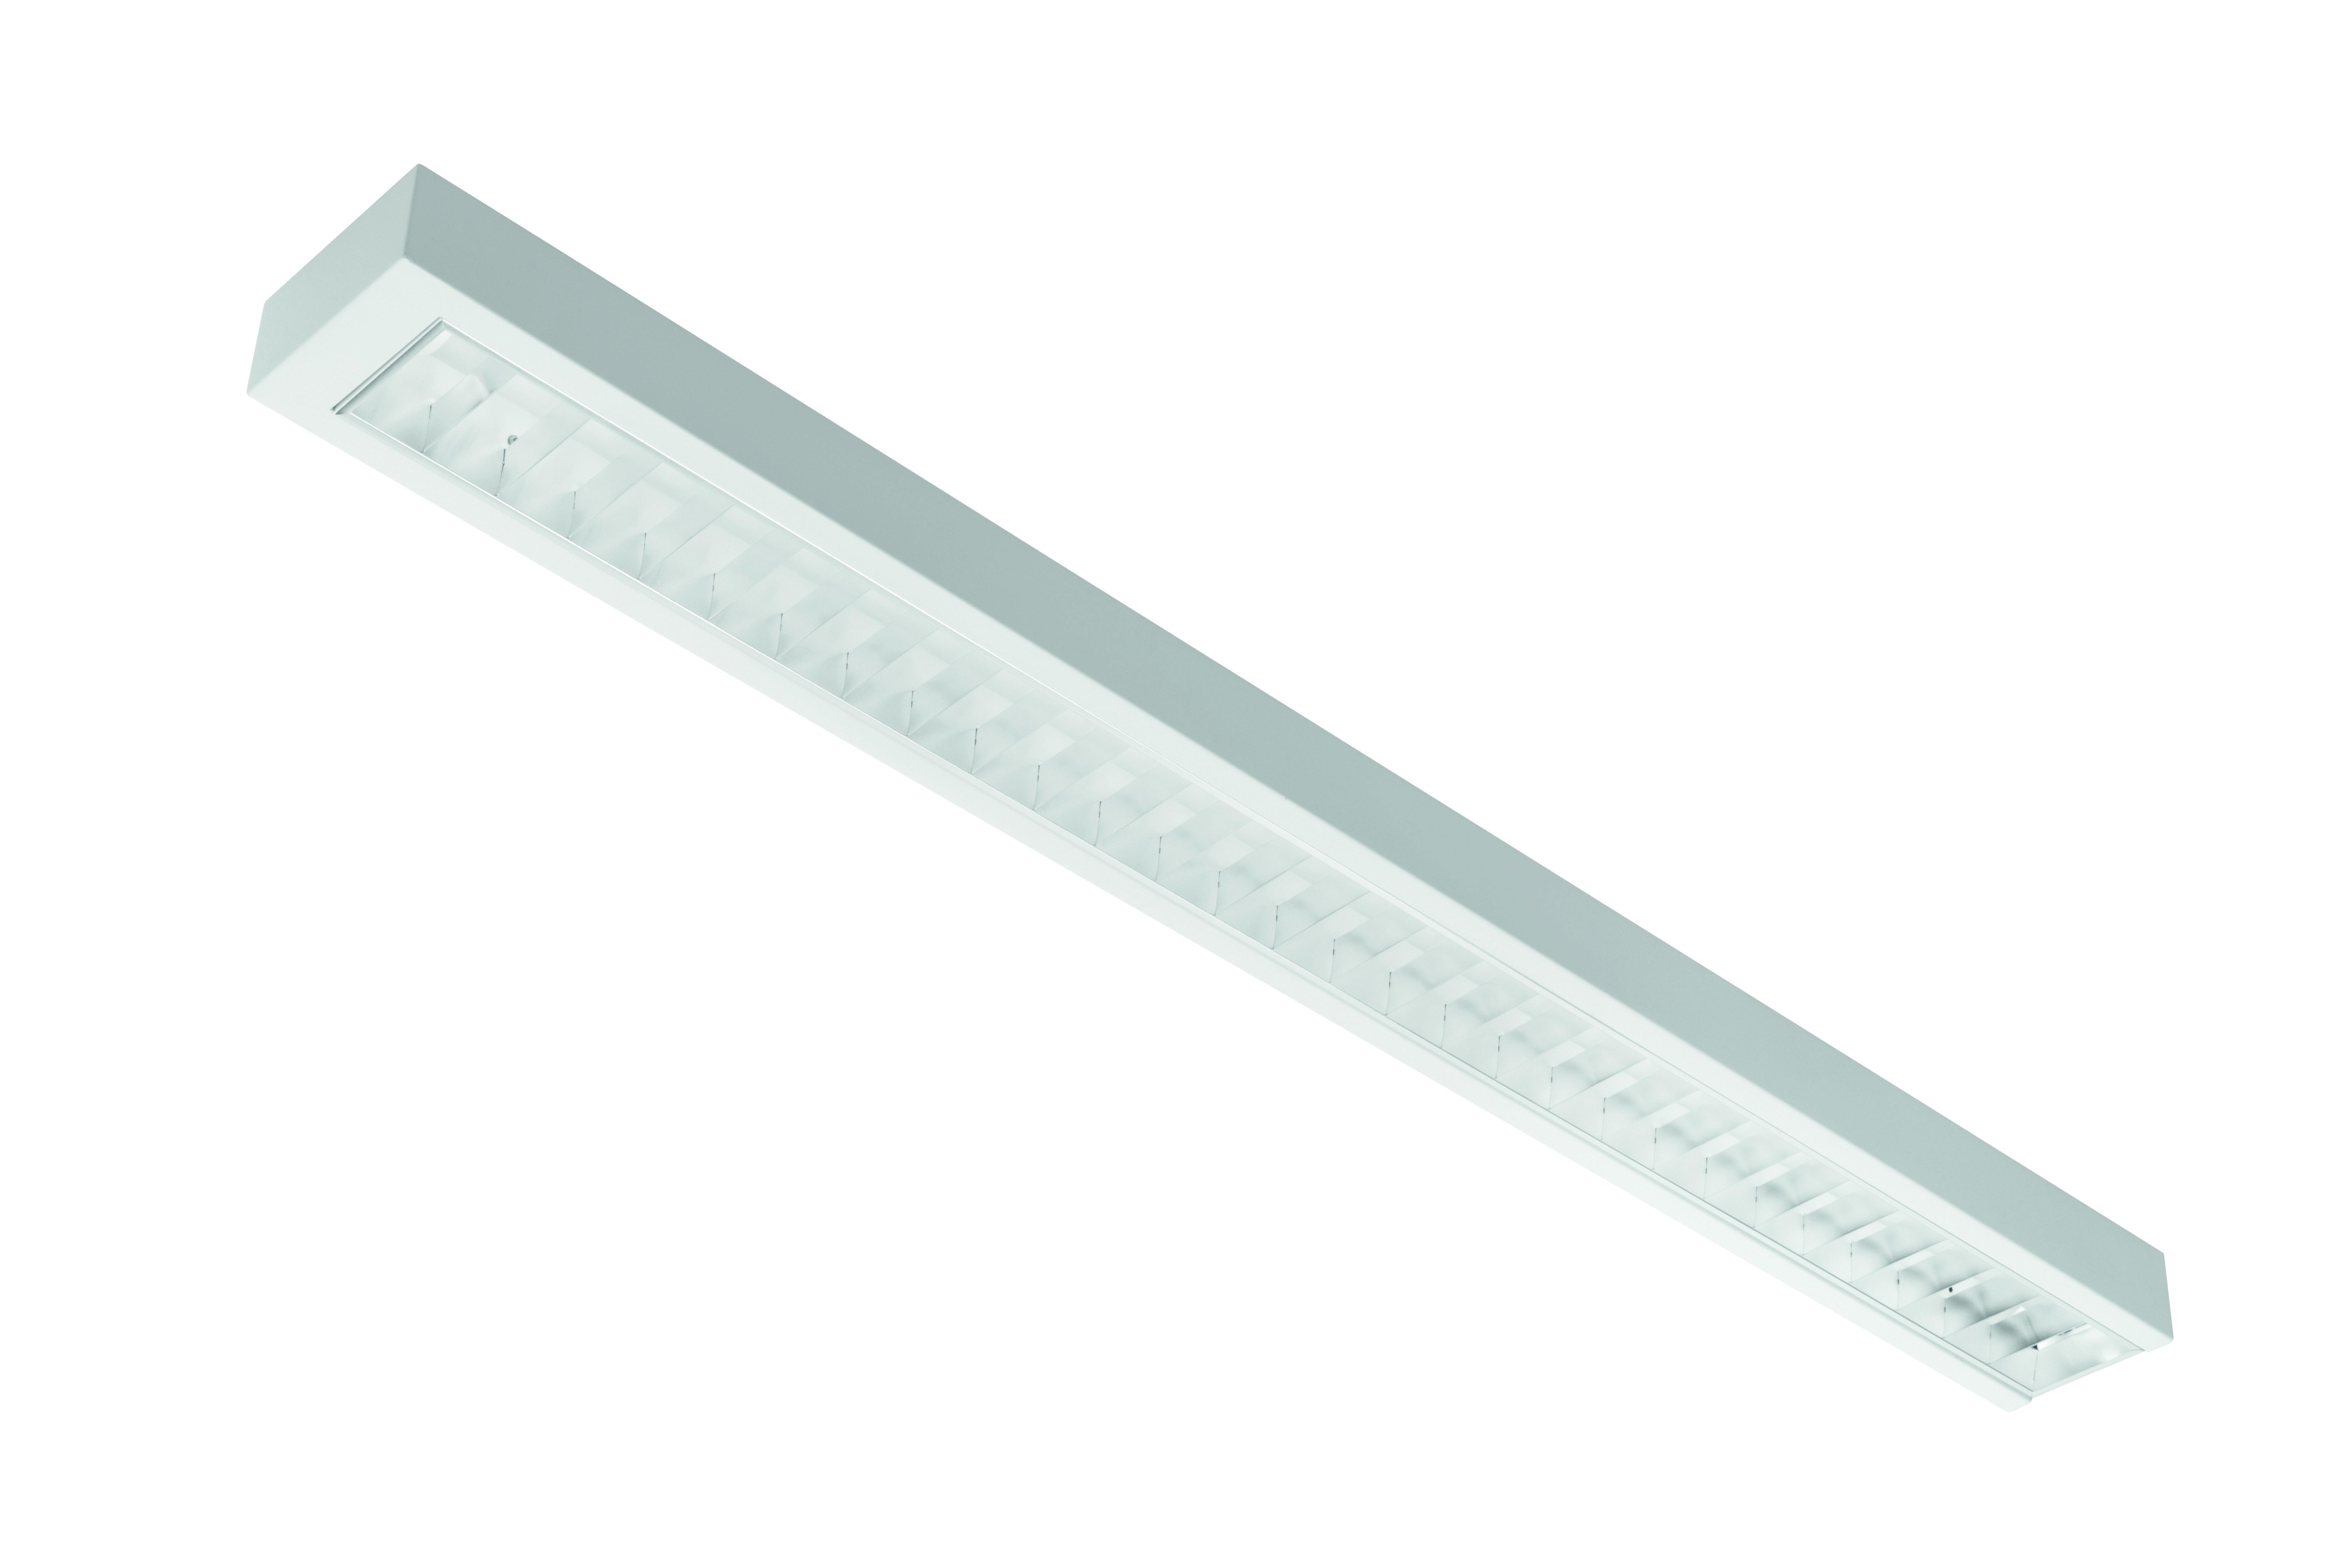 1 Stk SARM-LINE F-LED 118 L 1x42W 4000K, 5350lm, Ra>80, weiß, DALI LI99001698